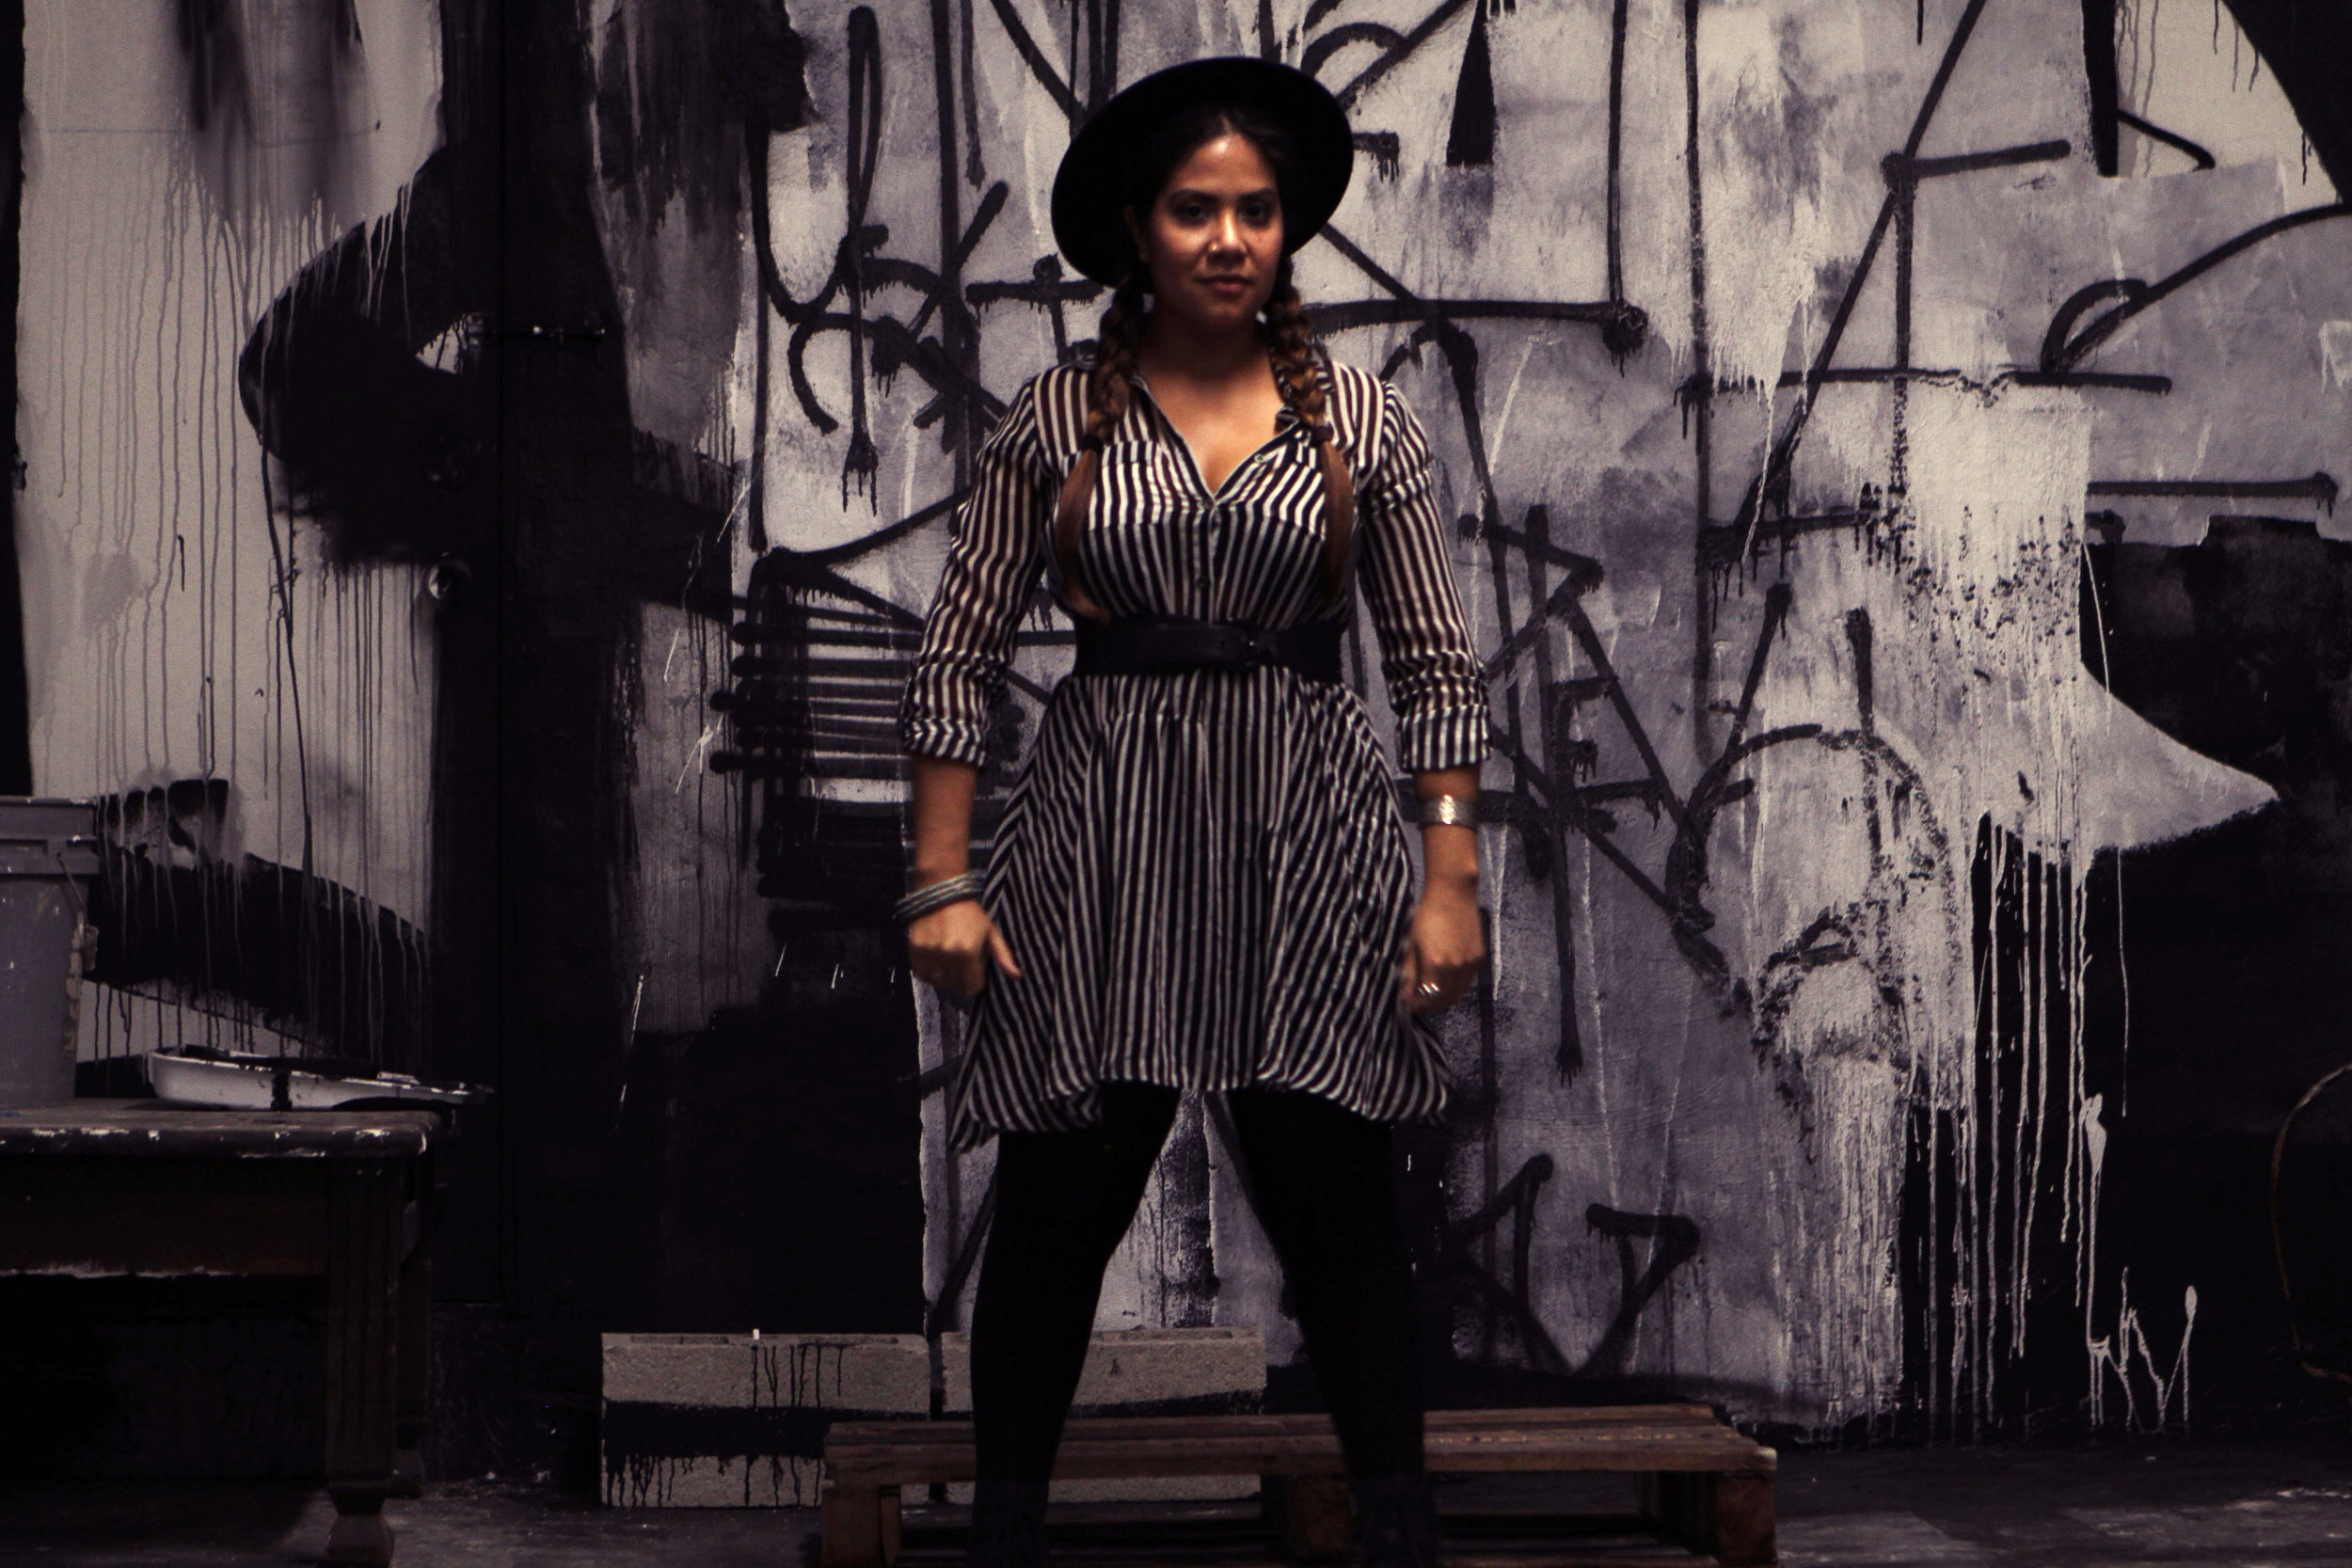 wynwood-artists-ivette-cabrera